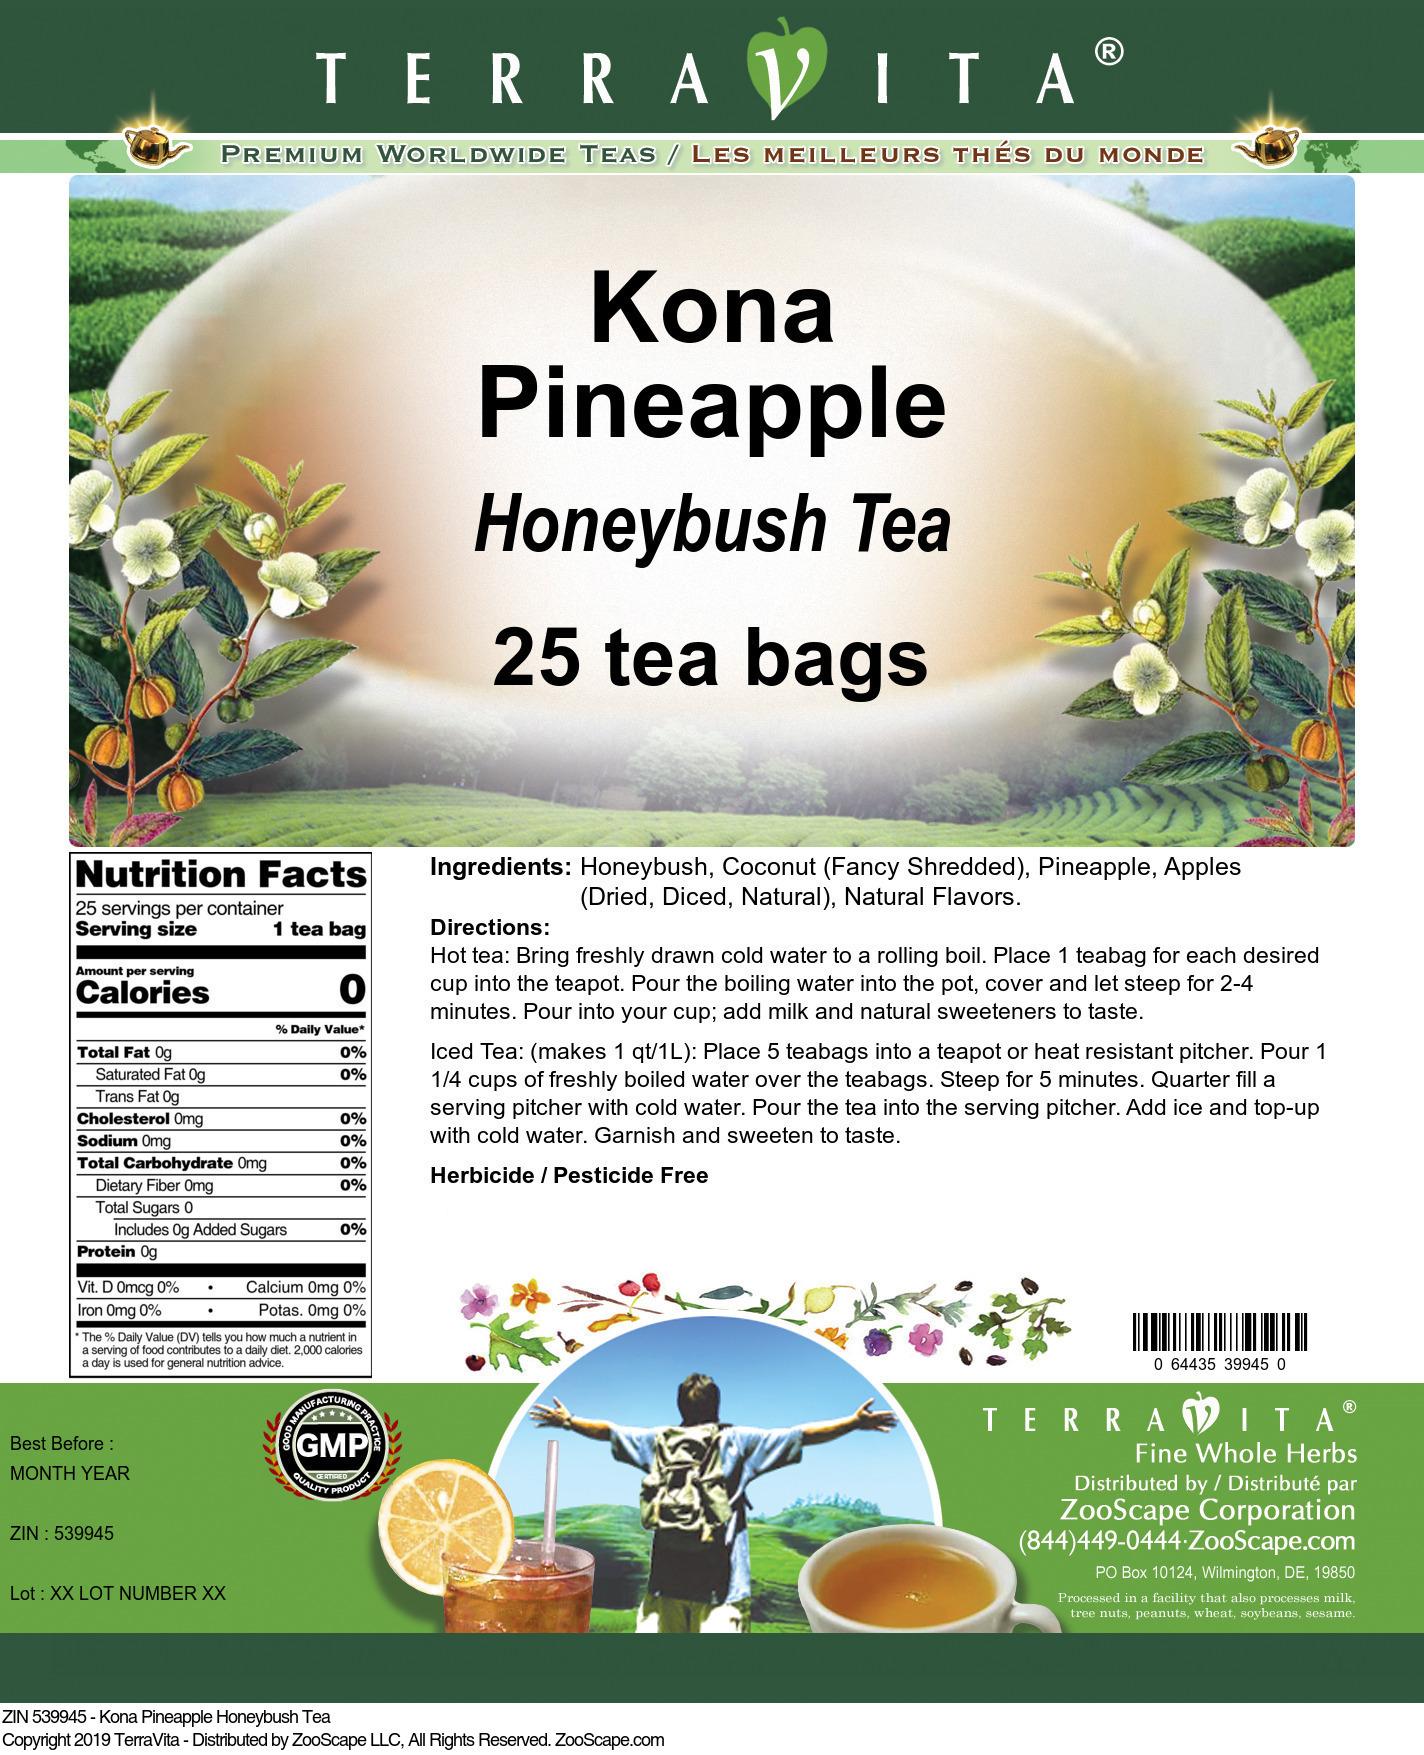 Kona Pineapple Honeybush Tea